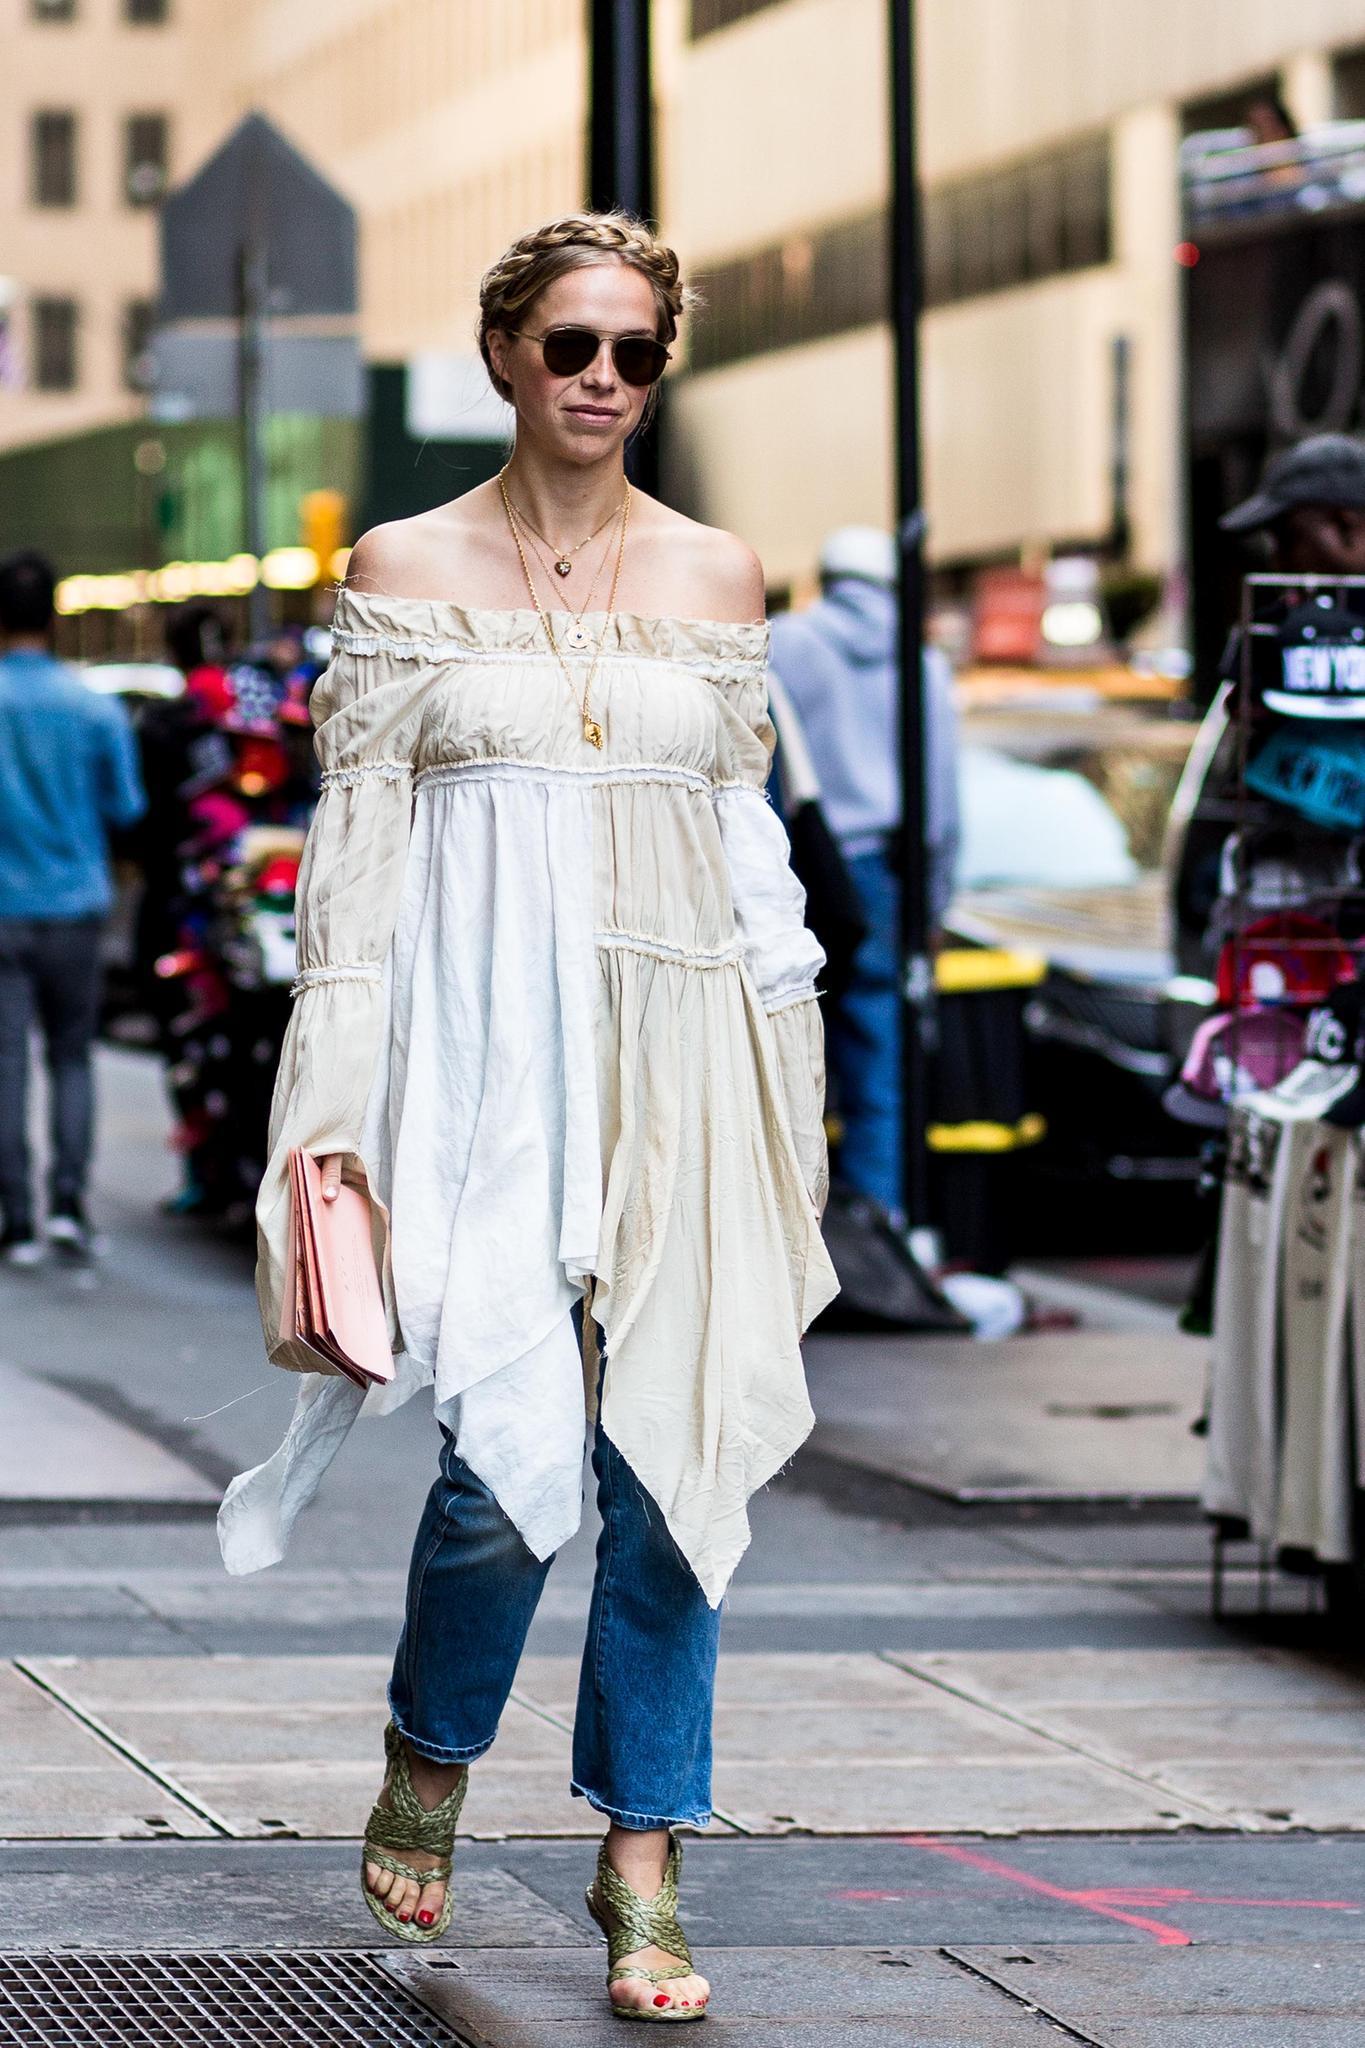 Hose über Kleid mit Carmenausschnitt an Frau